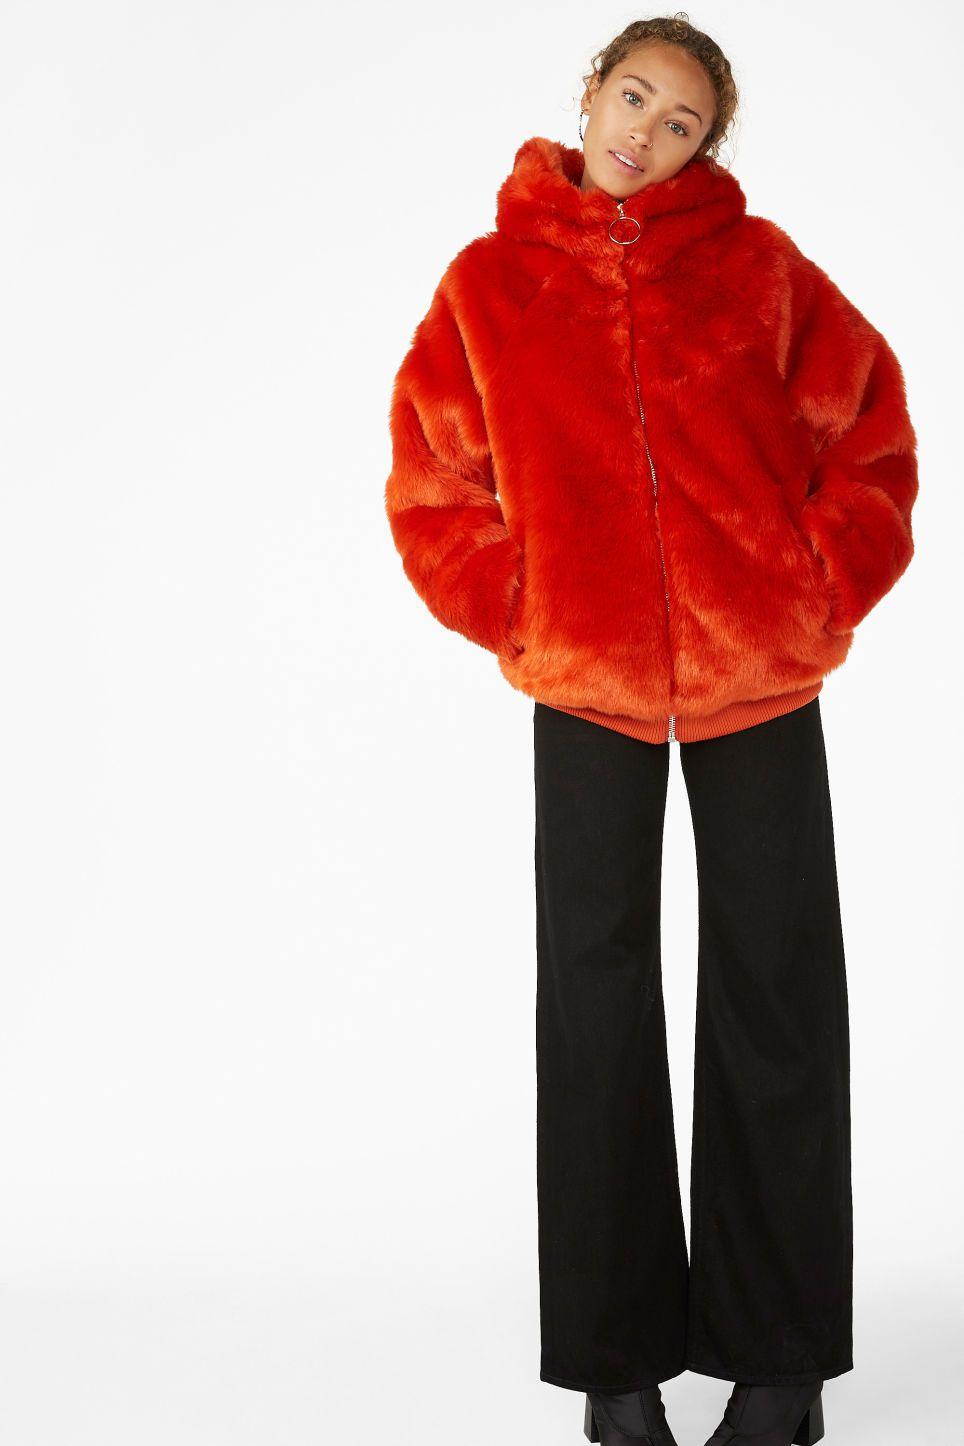 3b56ffcfe Hooded faux fur jacket - Orange goes red - Coats & Jackets ...